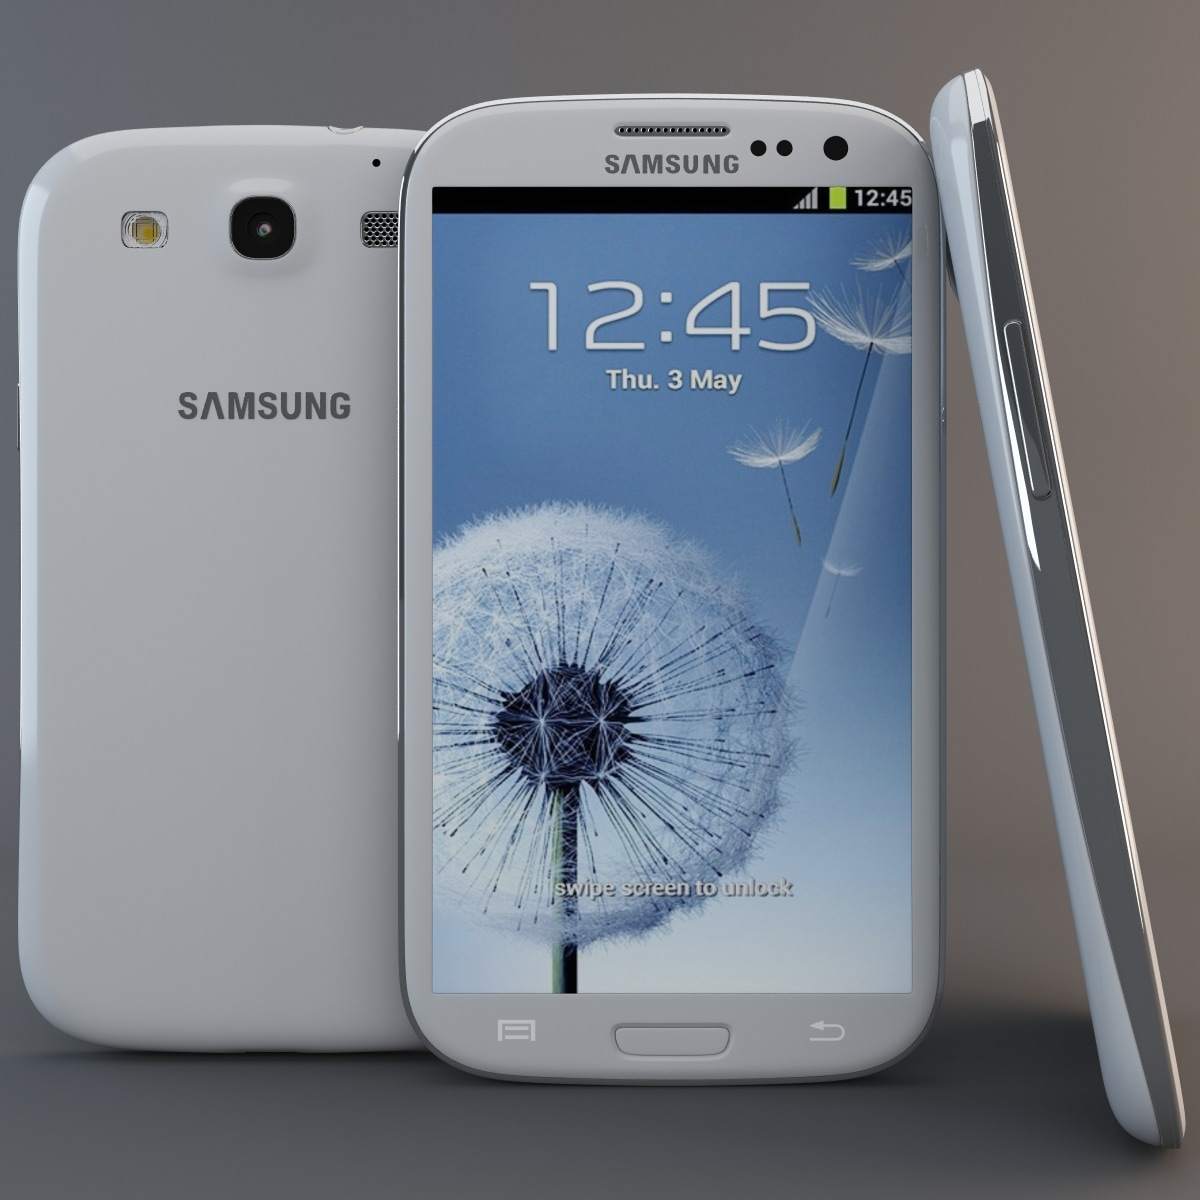 Samsung_Galaxy_S_III_white_005.jpg